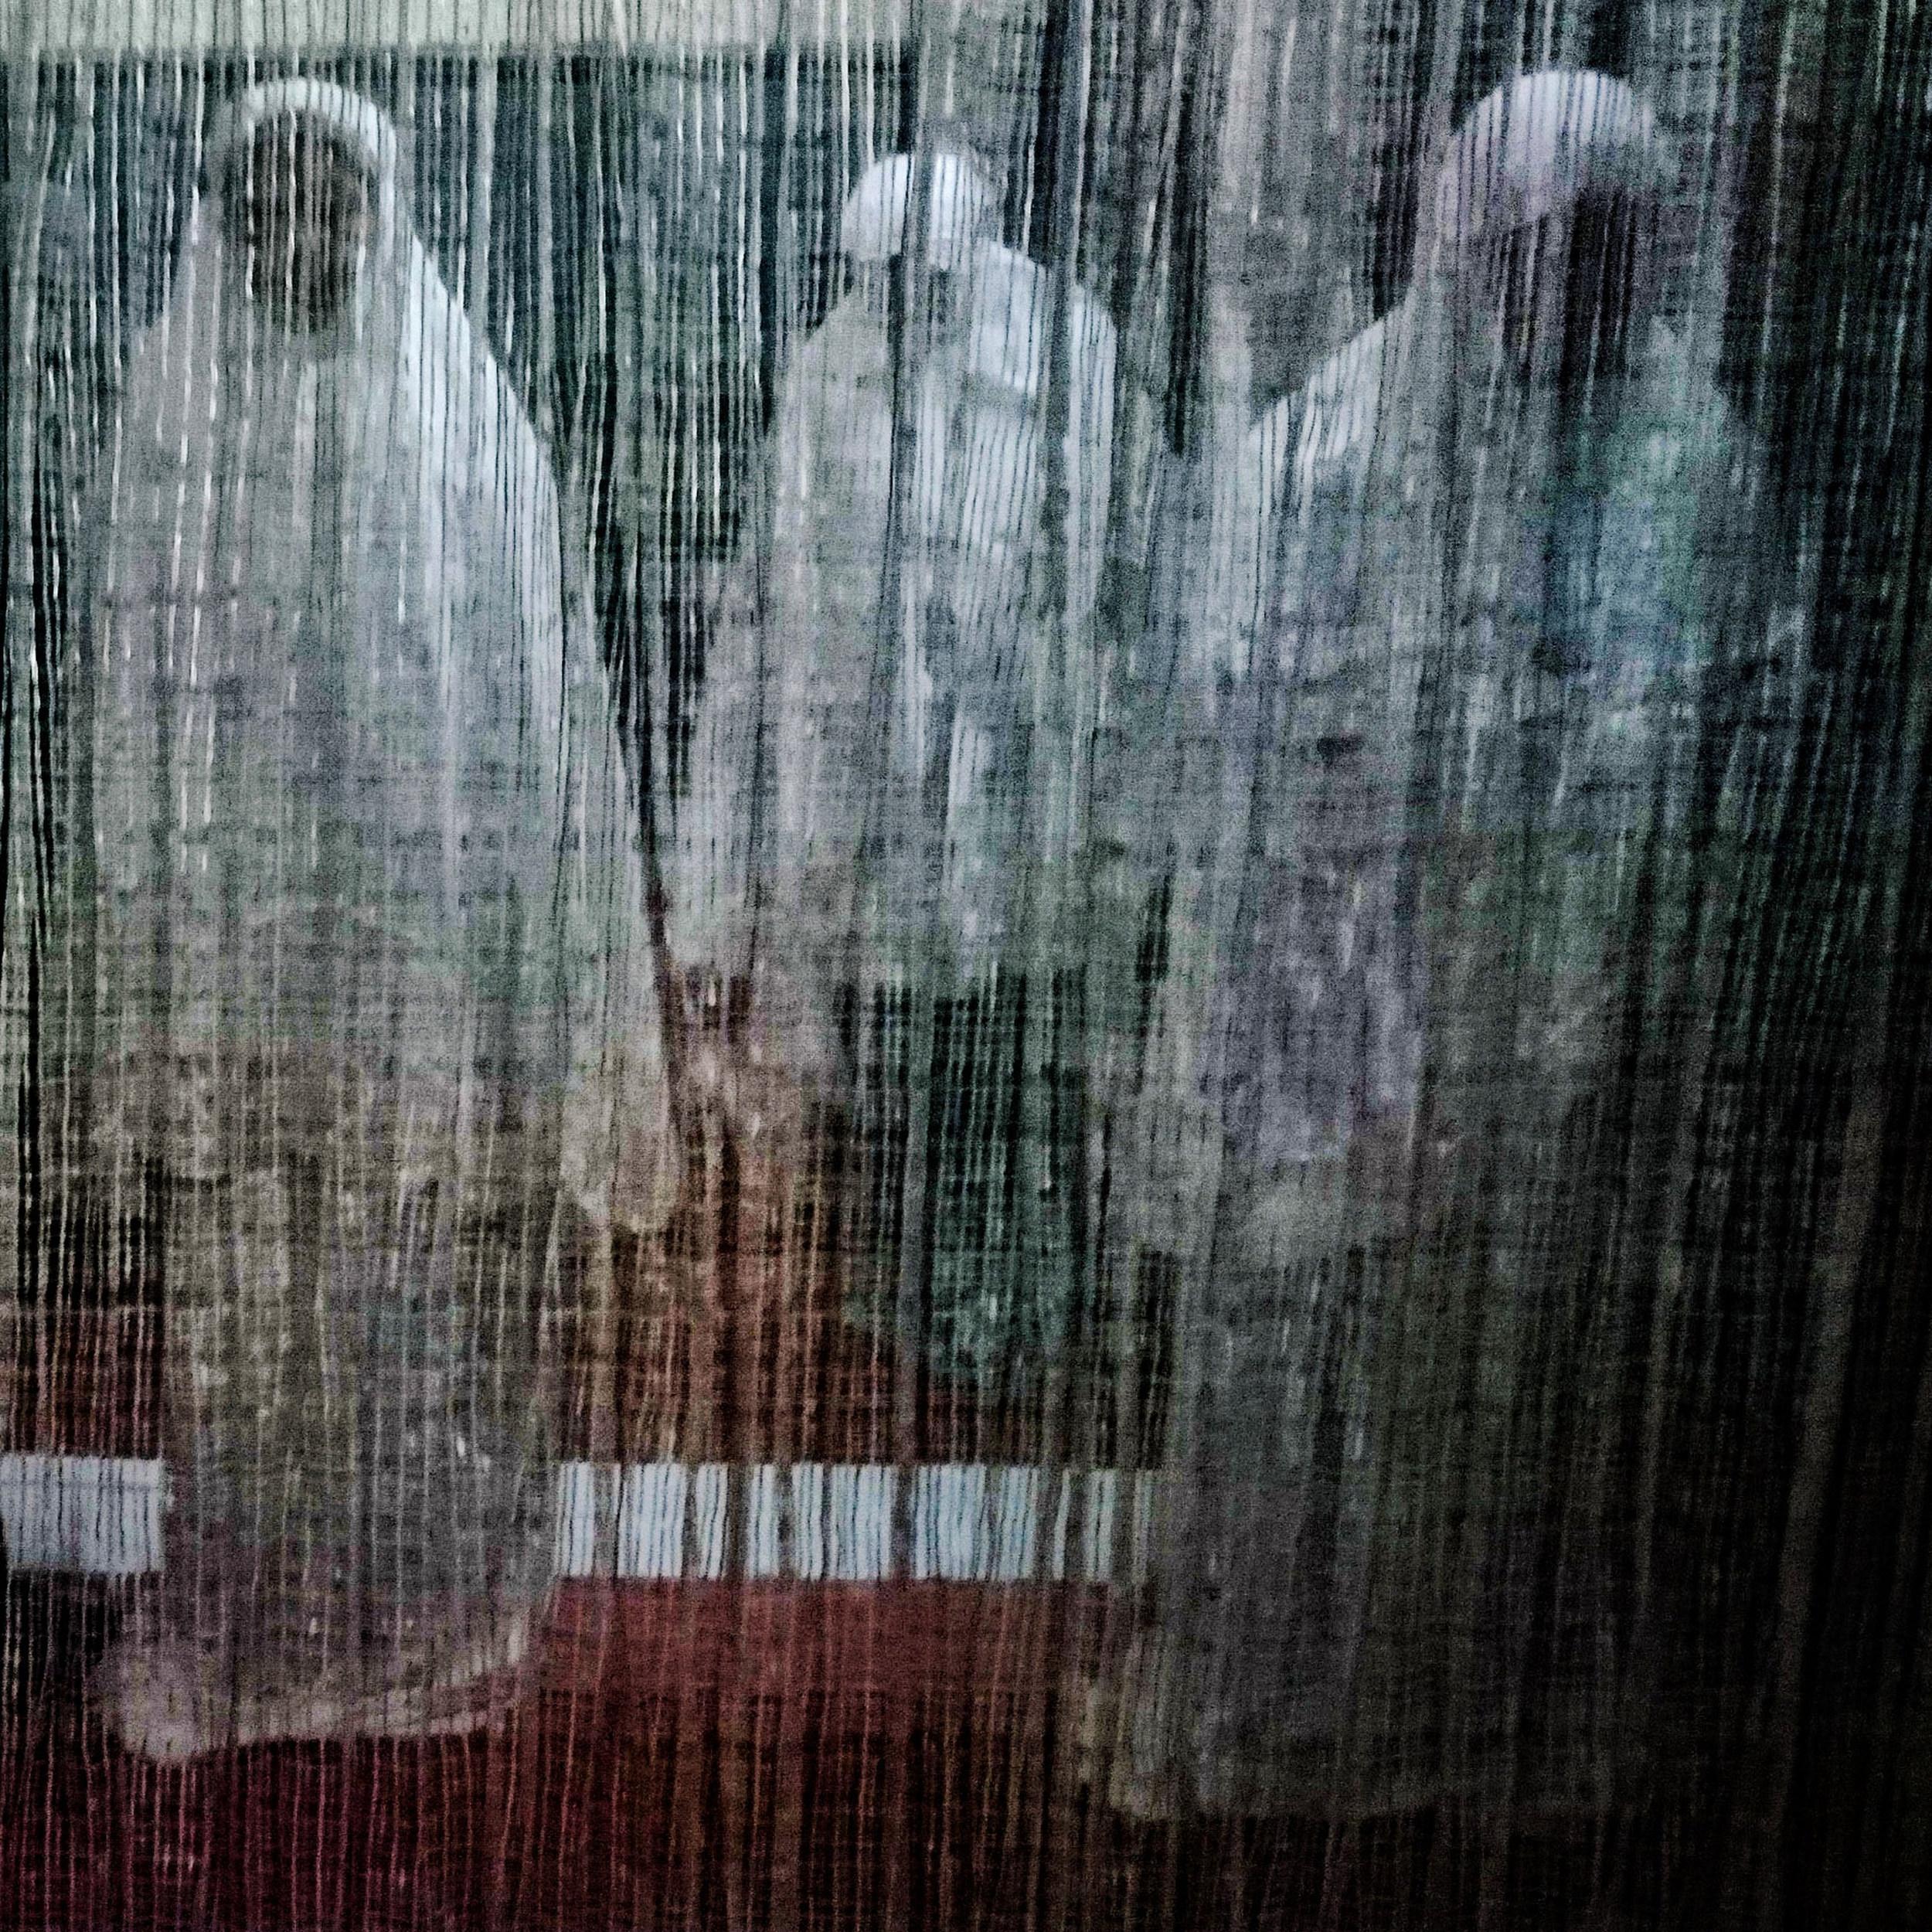 Malaysian Muslim women offering prayer behind the curtain in Kuala Lumpur, Malaysia. (Zulfadhli Zaki)